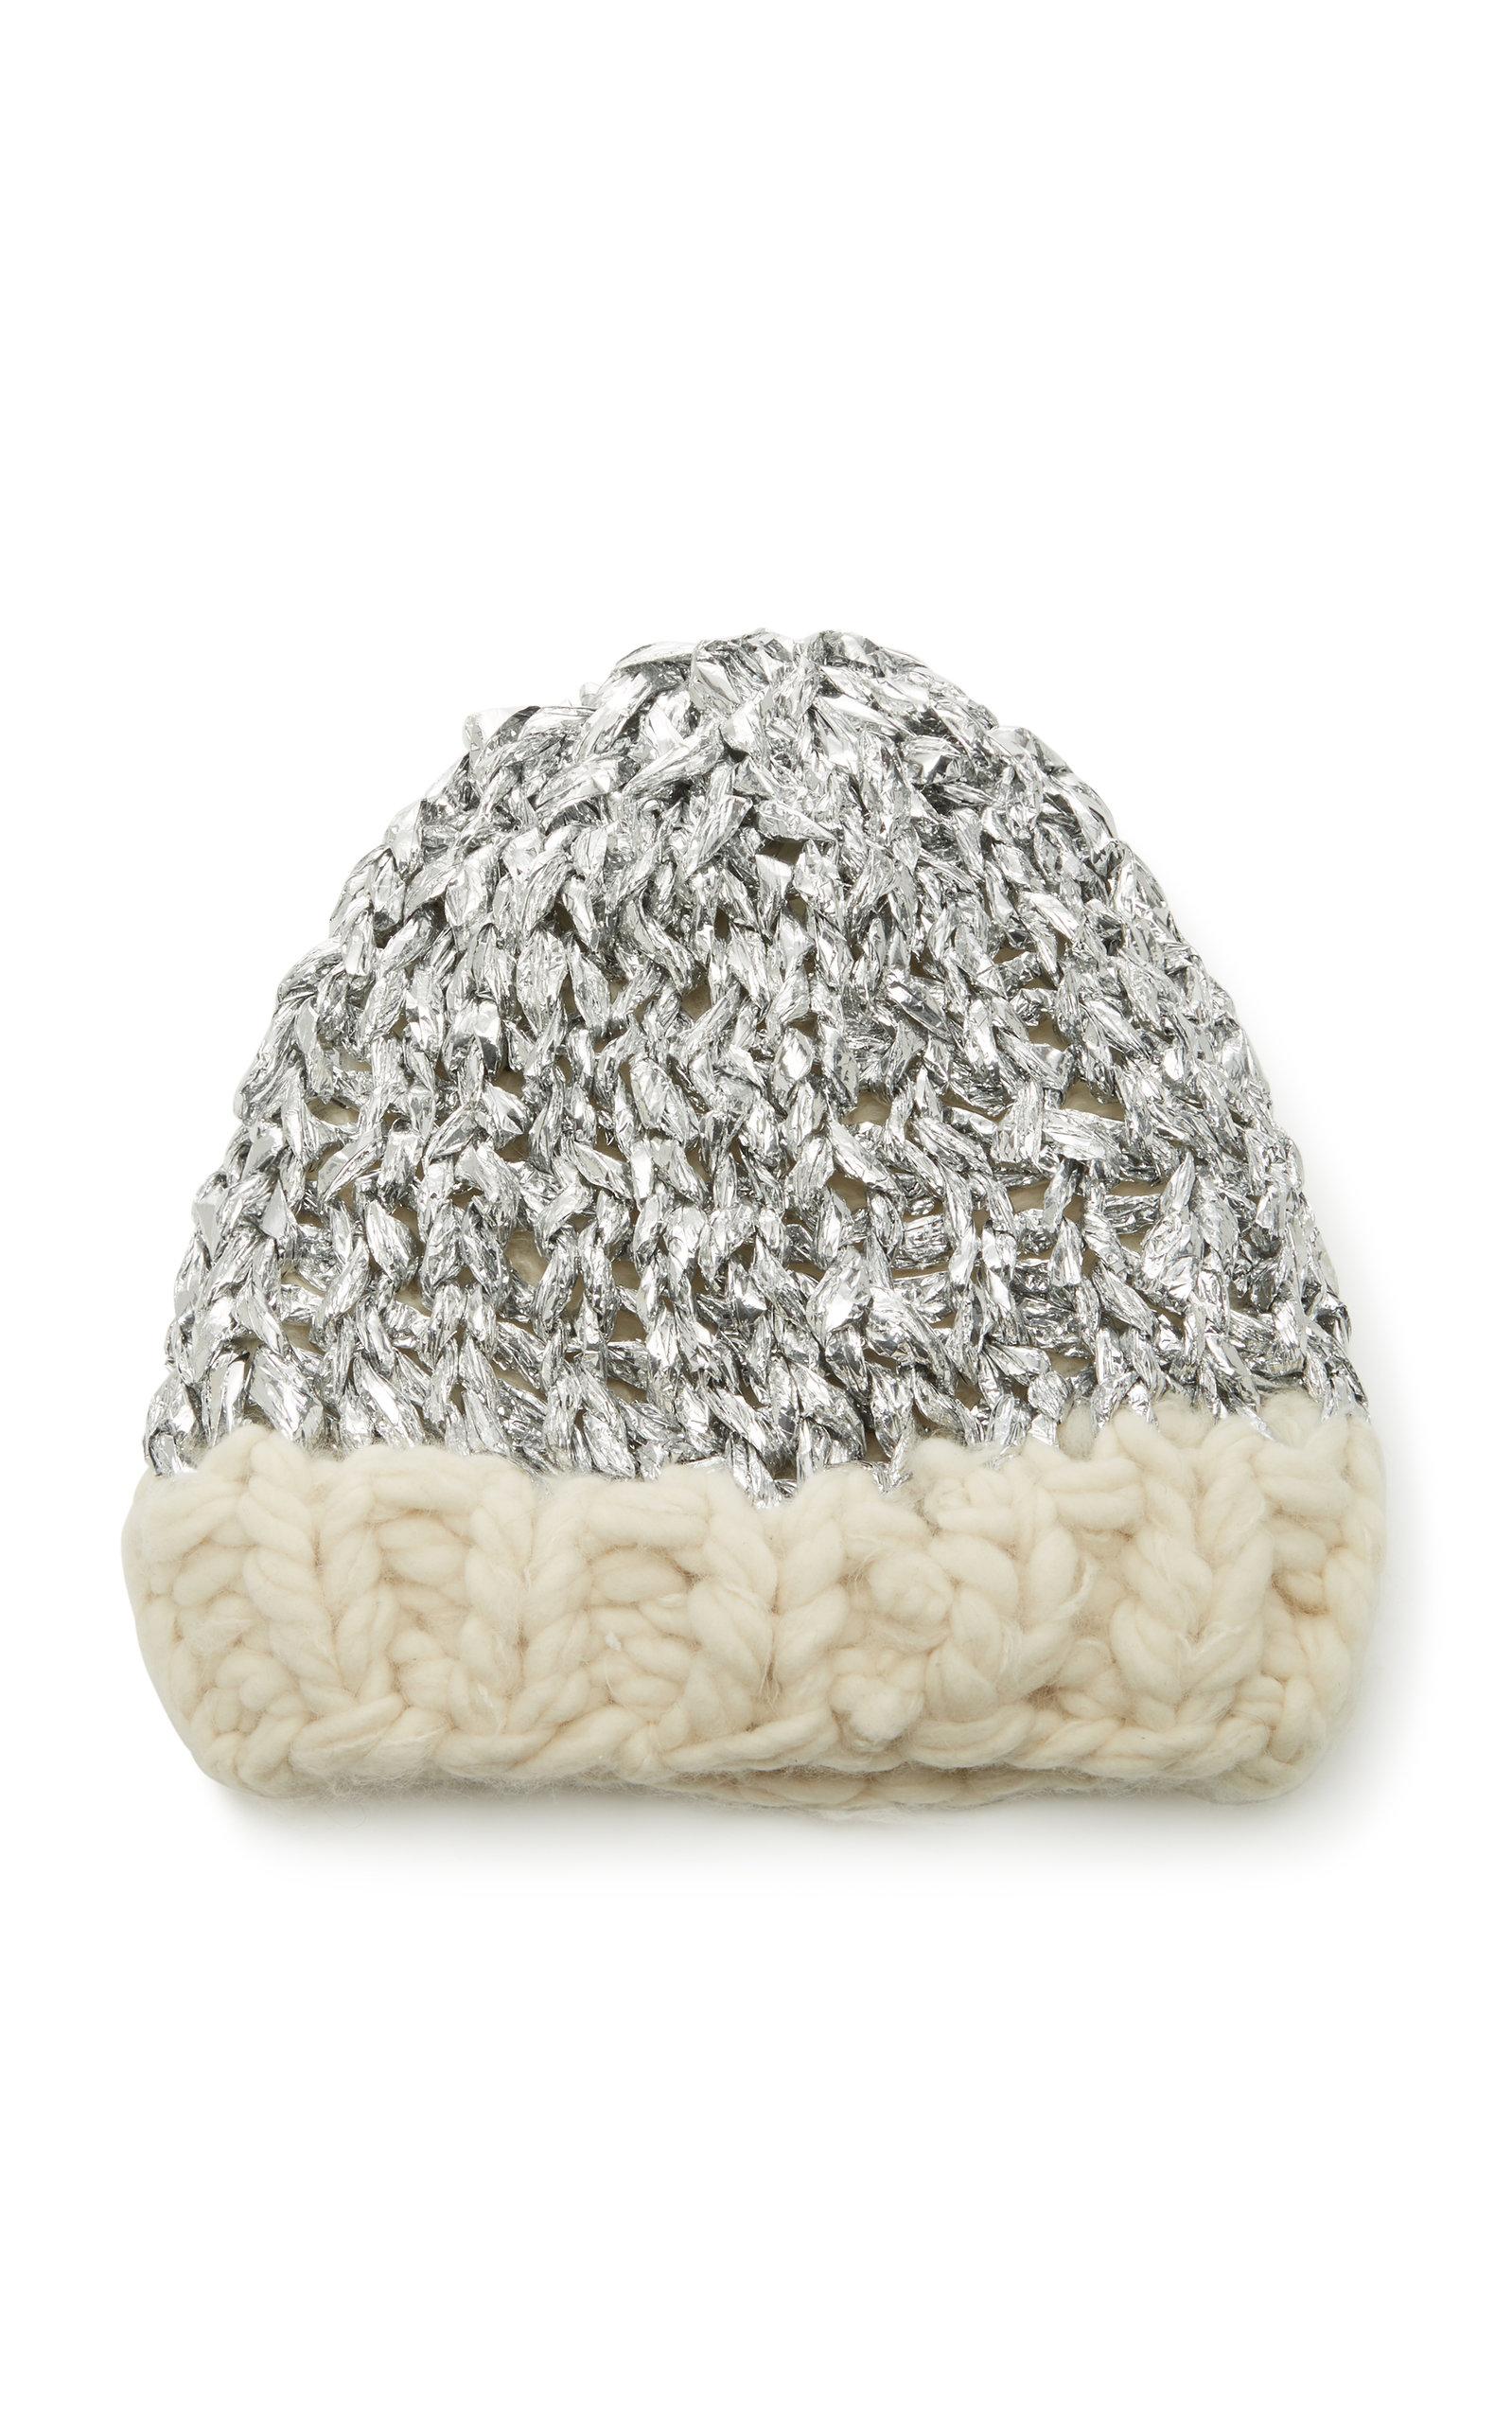 YESTADT MILLINERY Mylar Metallic Wool Beanie in Grey